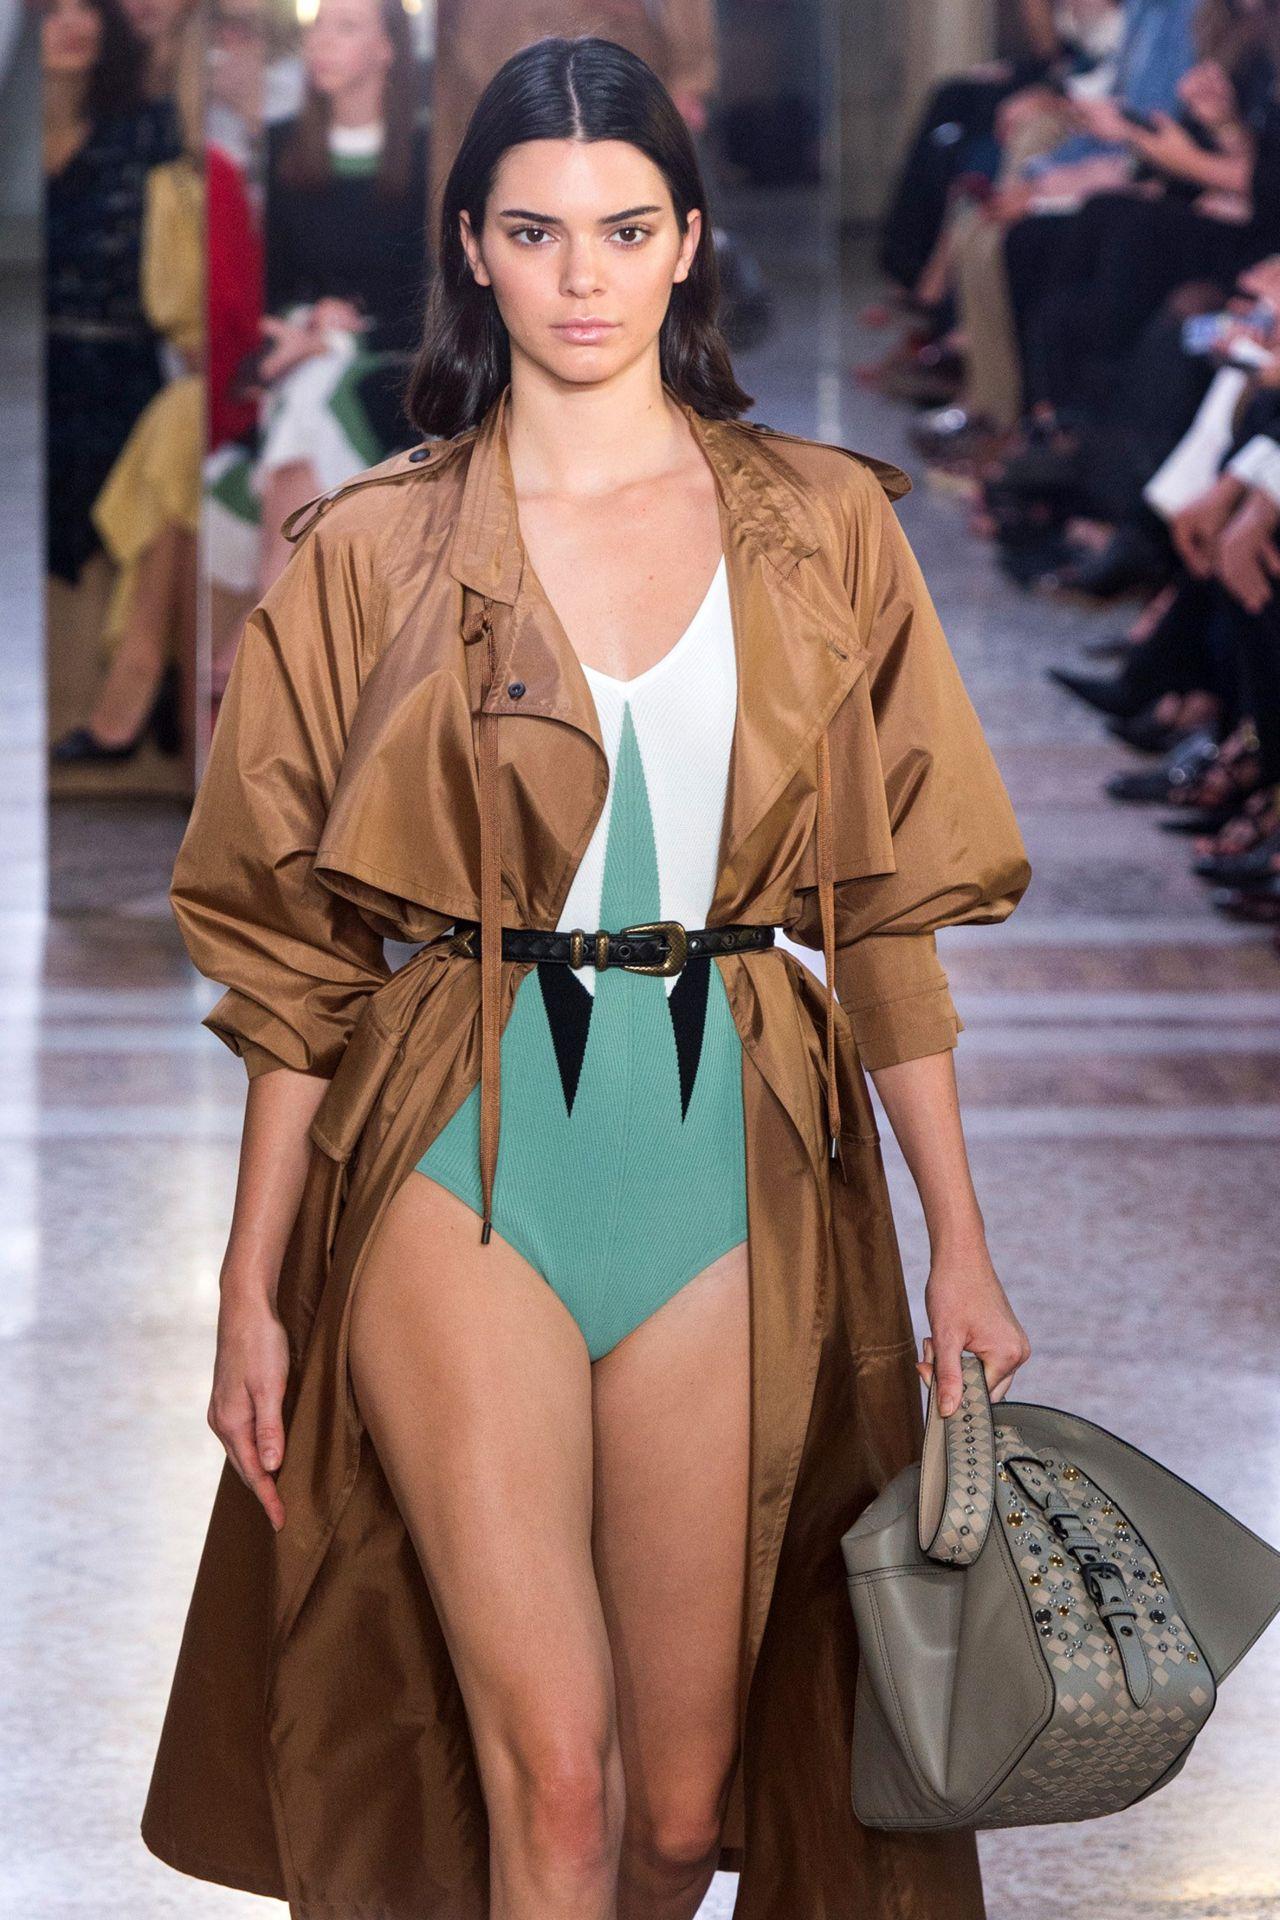 Kendall amp kylie jenner fap challenge teens bikini wank 4